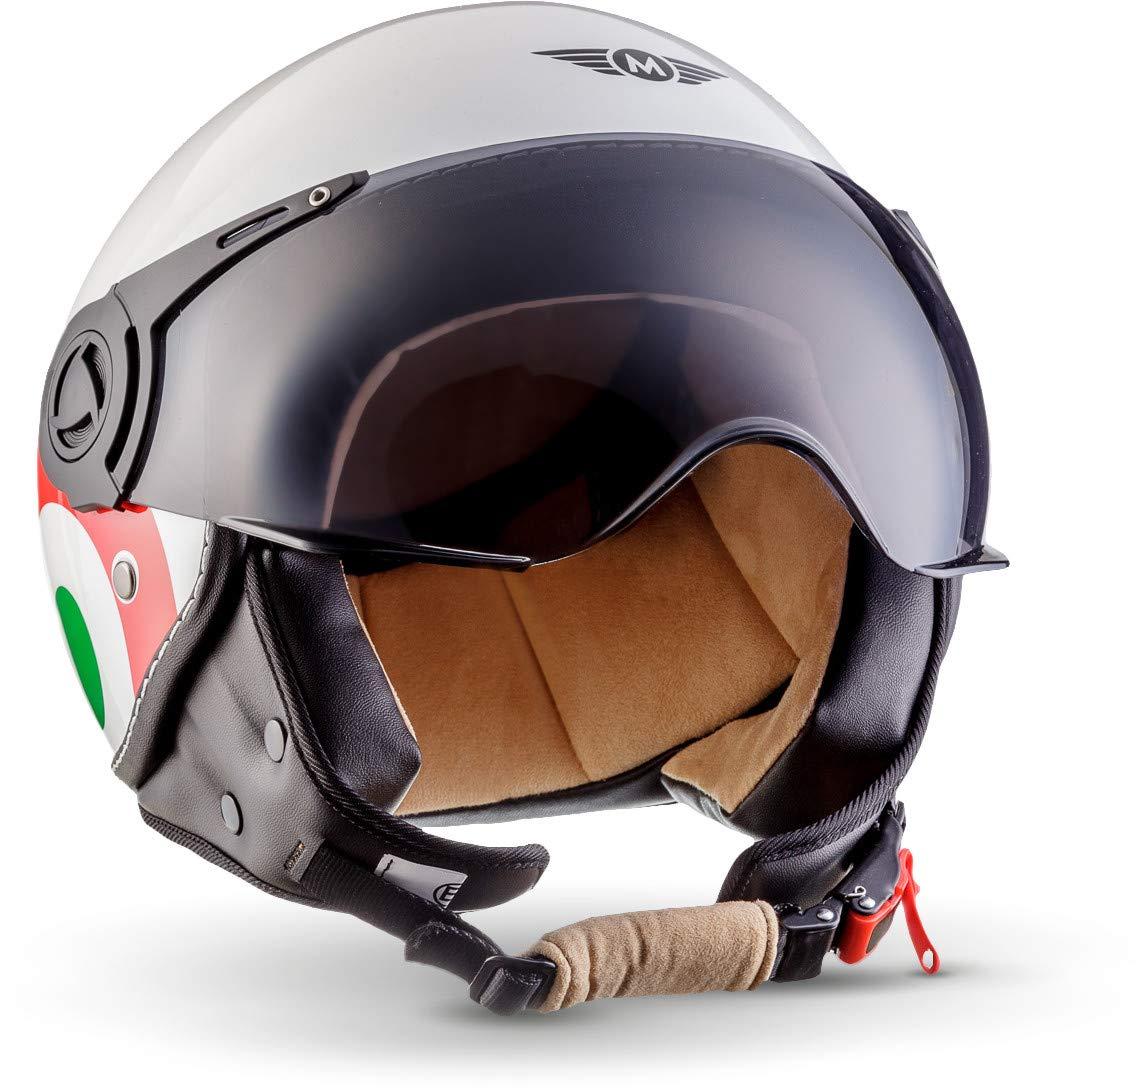 "Armor /· AV-84 /""Vintage Deluxe/"" /· Casco moto Demi Jet /· Scooter Urbano motocicleta Helmet Urban Retro /· ECE certificado /· Visor /· Click-n-Secure/™ Clip /· Bolsa de transporte /· XL 61-6"